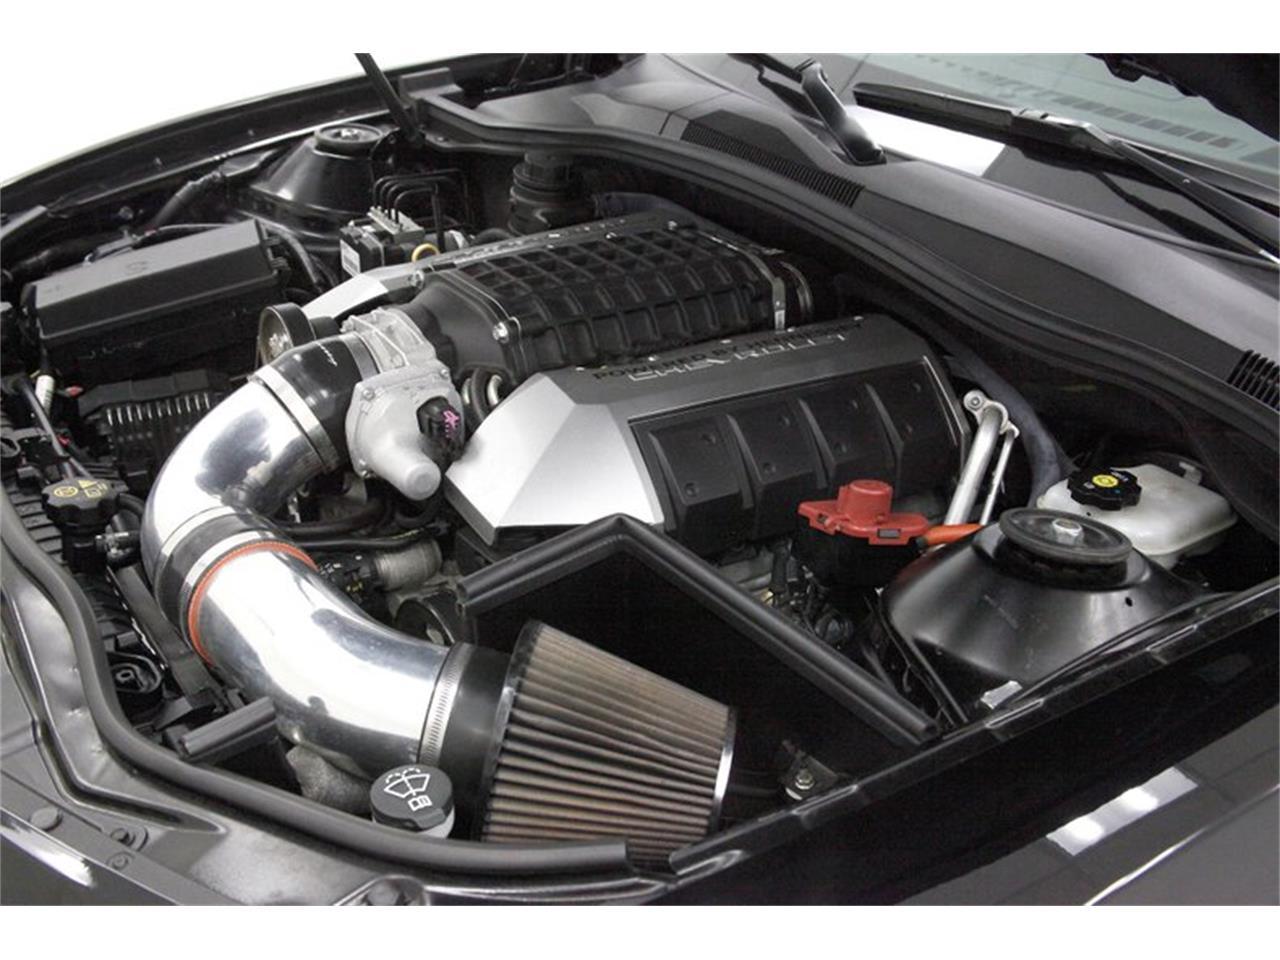 2011 Chevrolet Camaro (CC-1159175) for sale in Morgantown, Pennsylvania